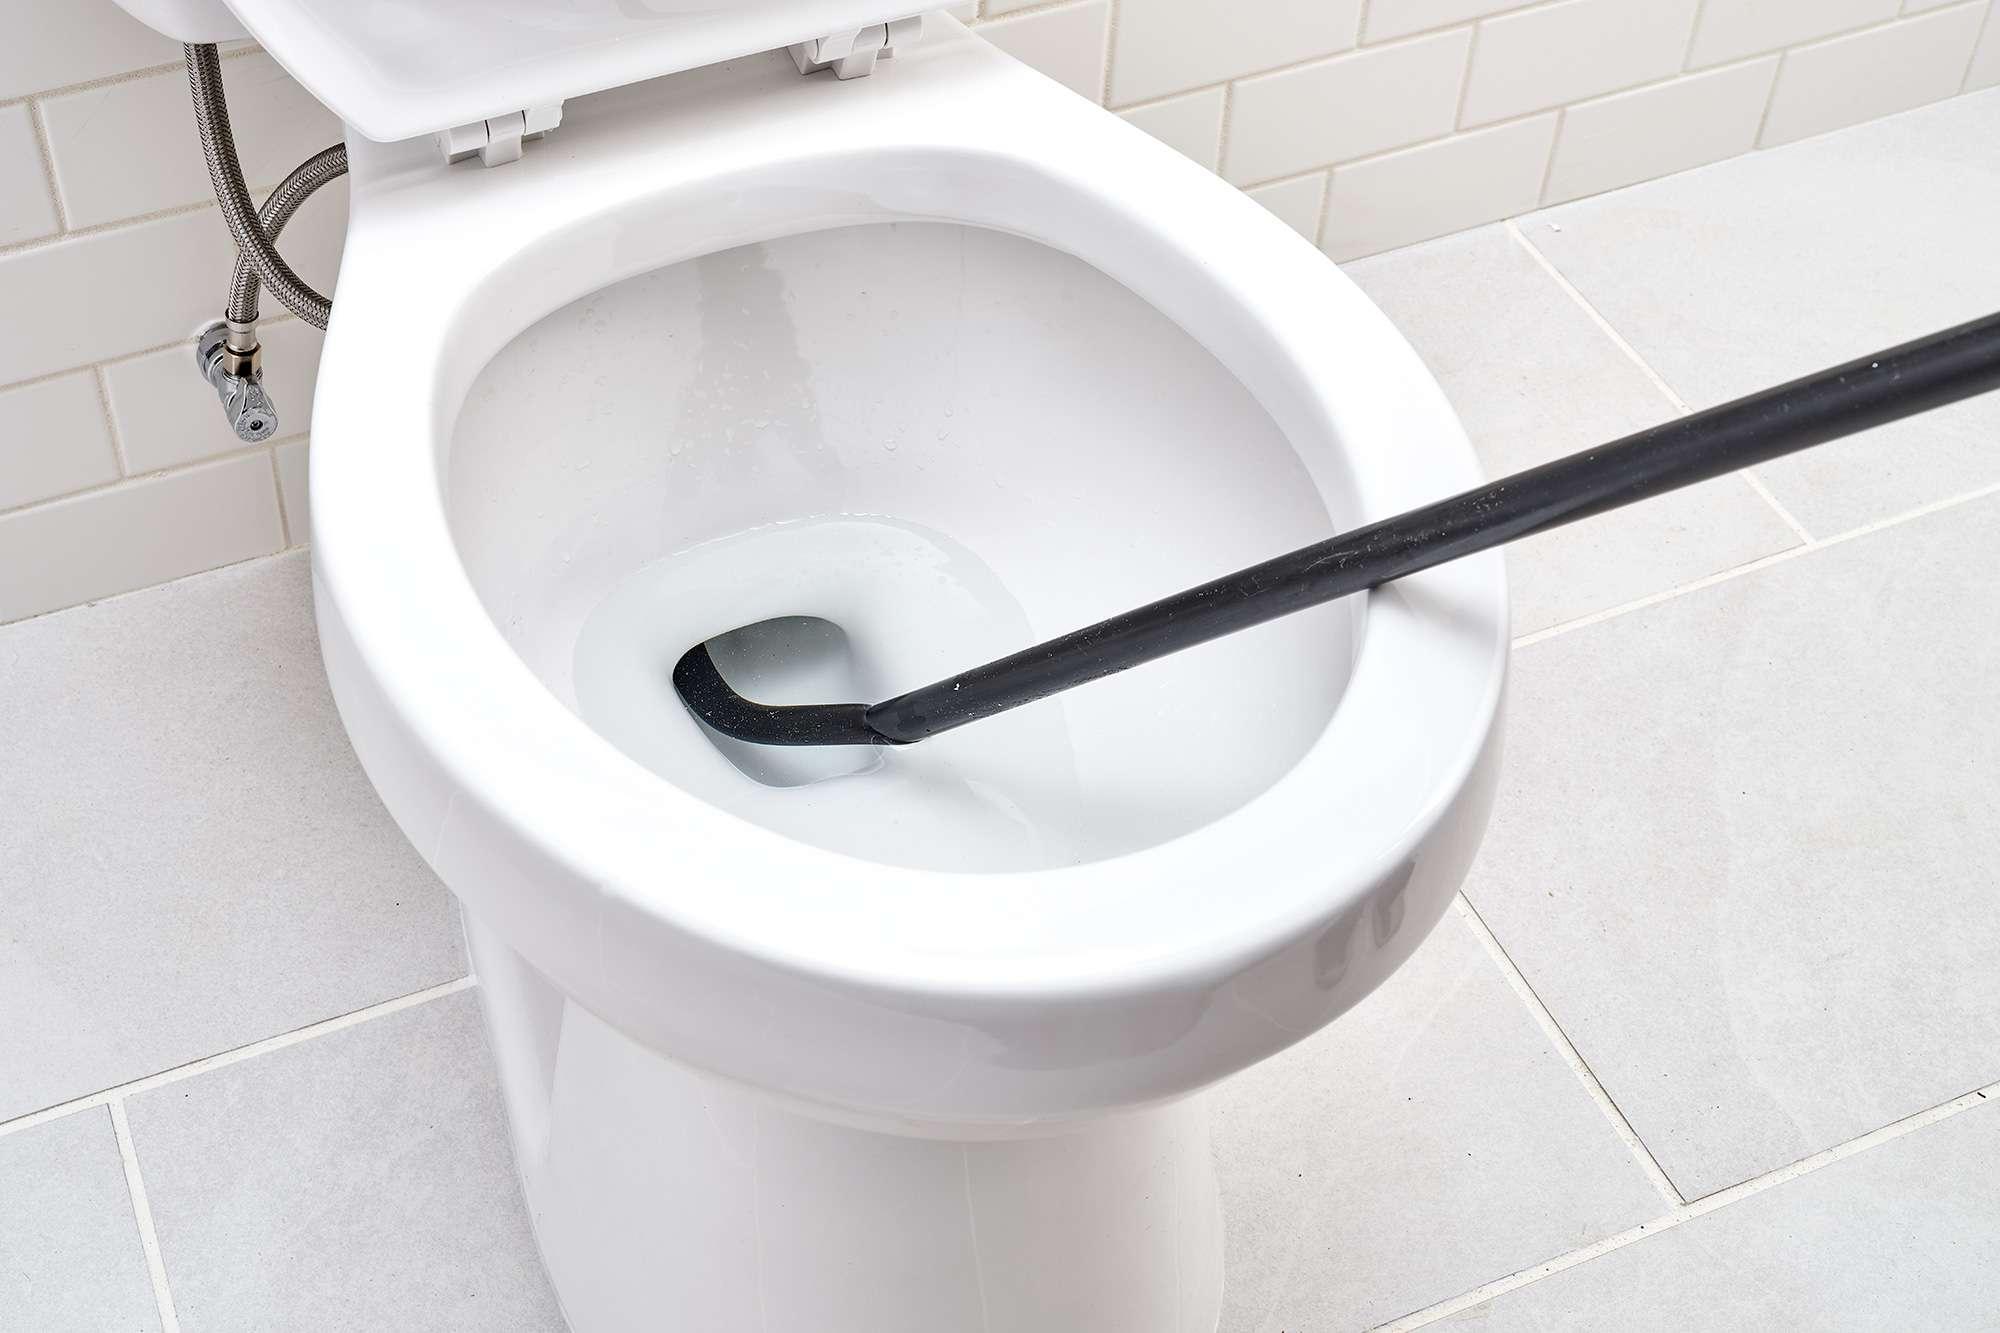 Black toilet auger inserted inside hole of toilet bowl